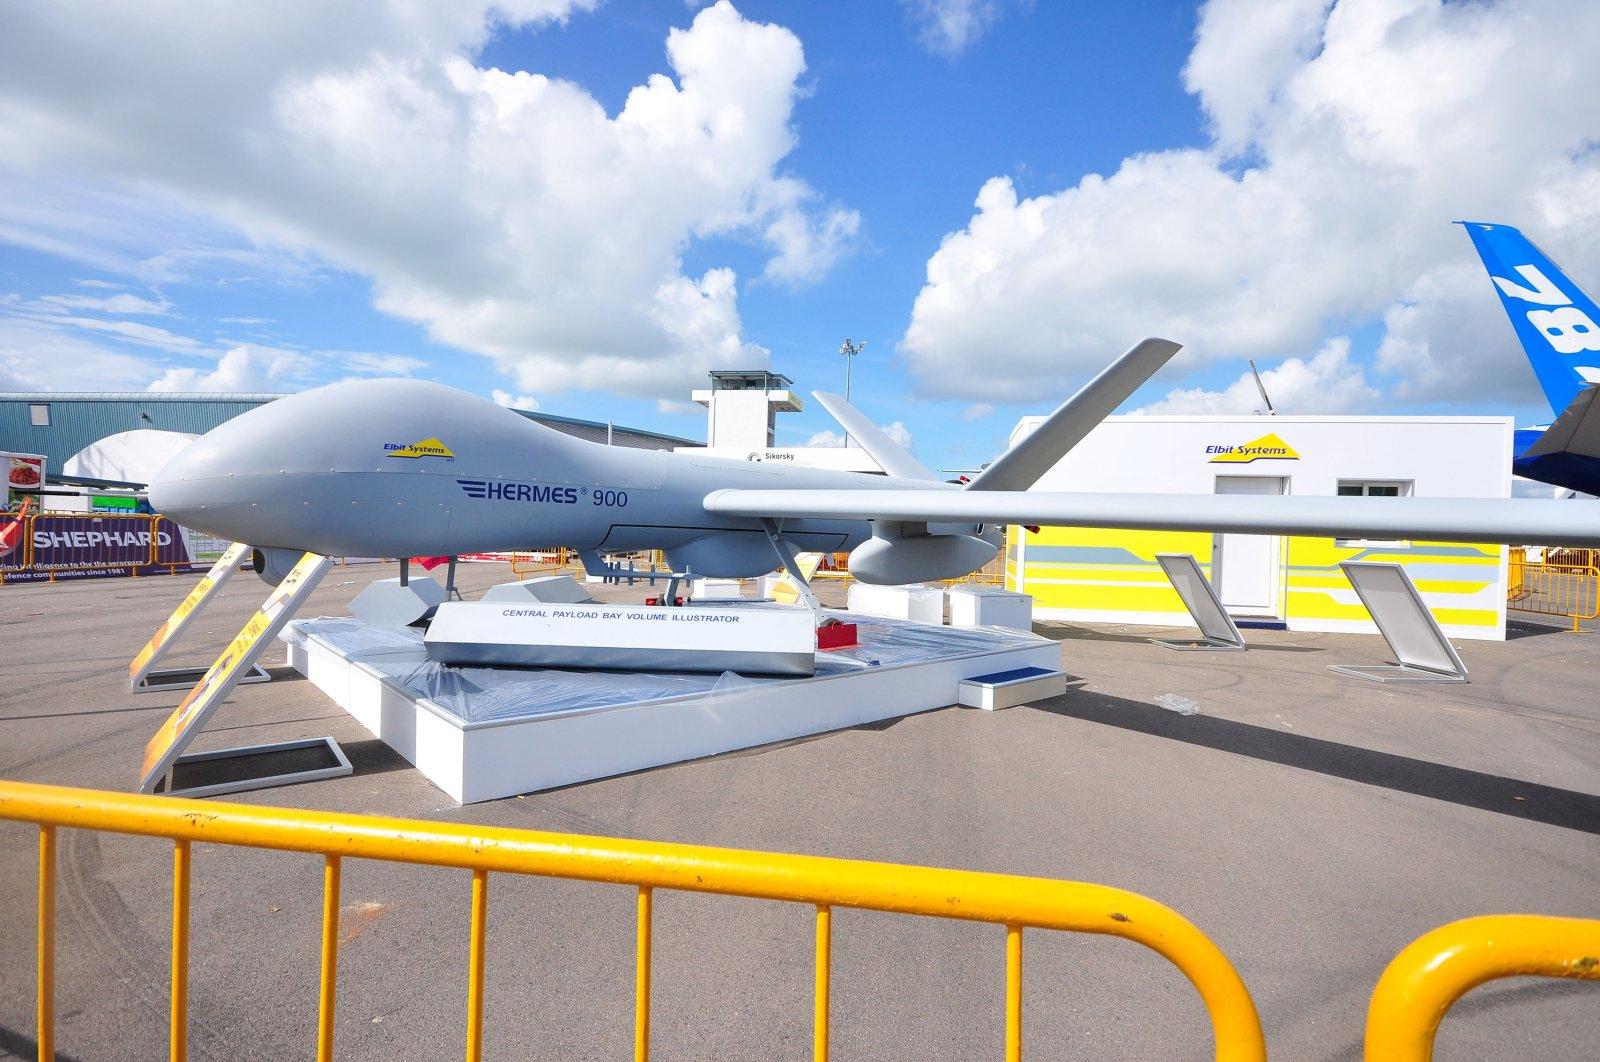 Elbit Sytems showcasing their Hermes 900, a medium-altitude long-endurance UAV, at Singapore Airshow, Feb. 12, 2012. (Shutterstock Photo)